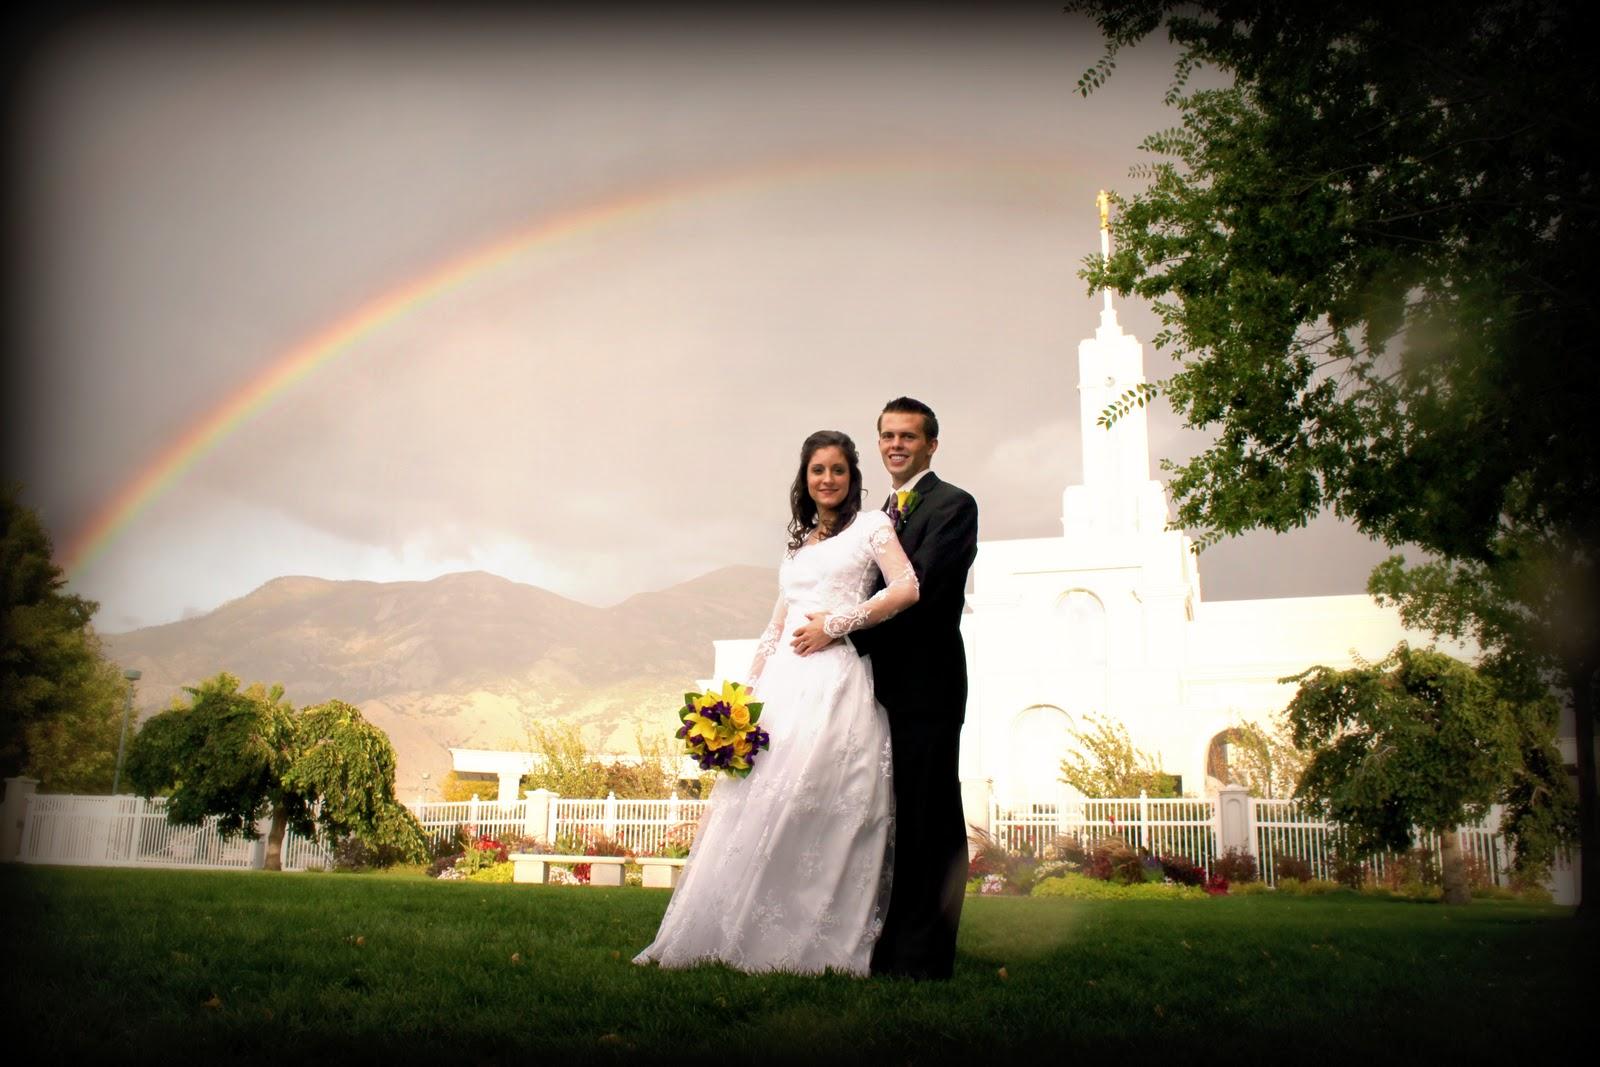 Cheap Wedding Photography Utah: Bridals, Wedding, Mt Timpanogos Temple, American Fork Utah